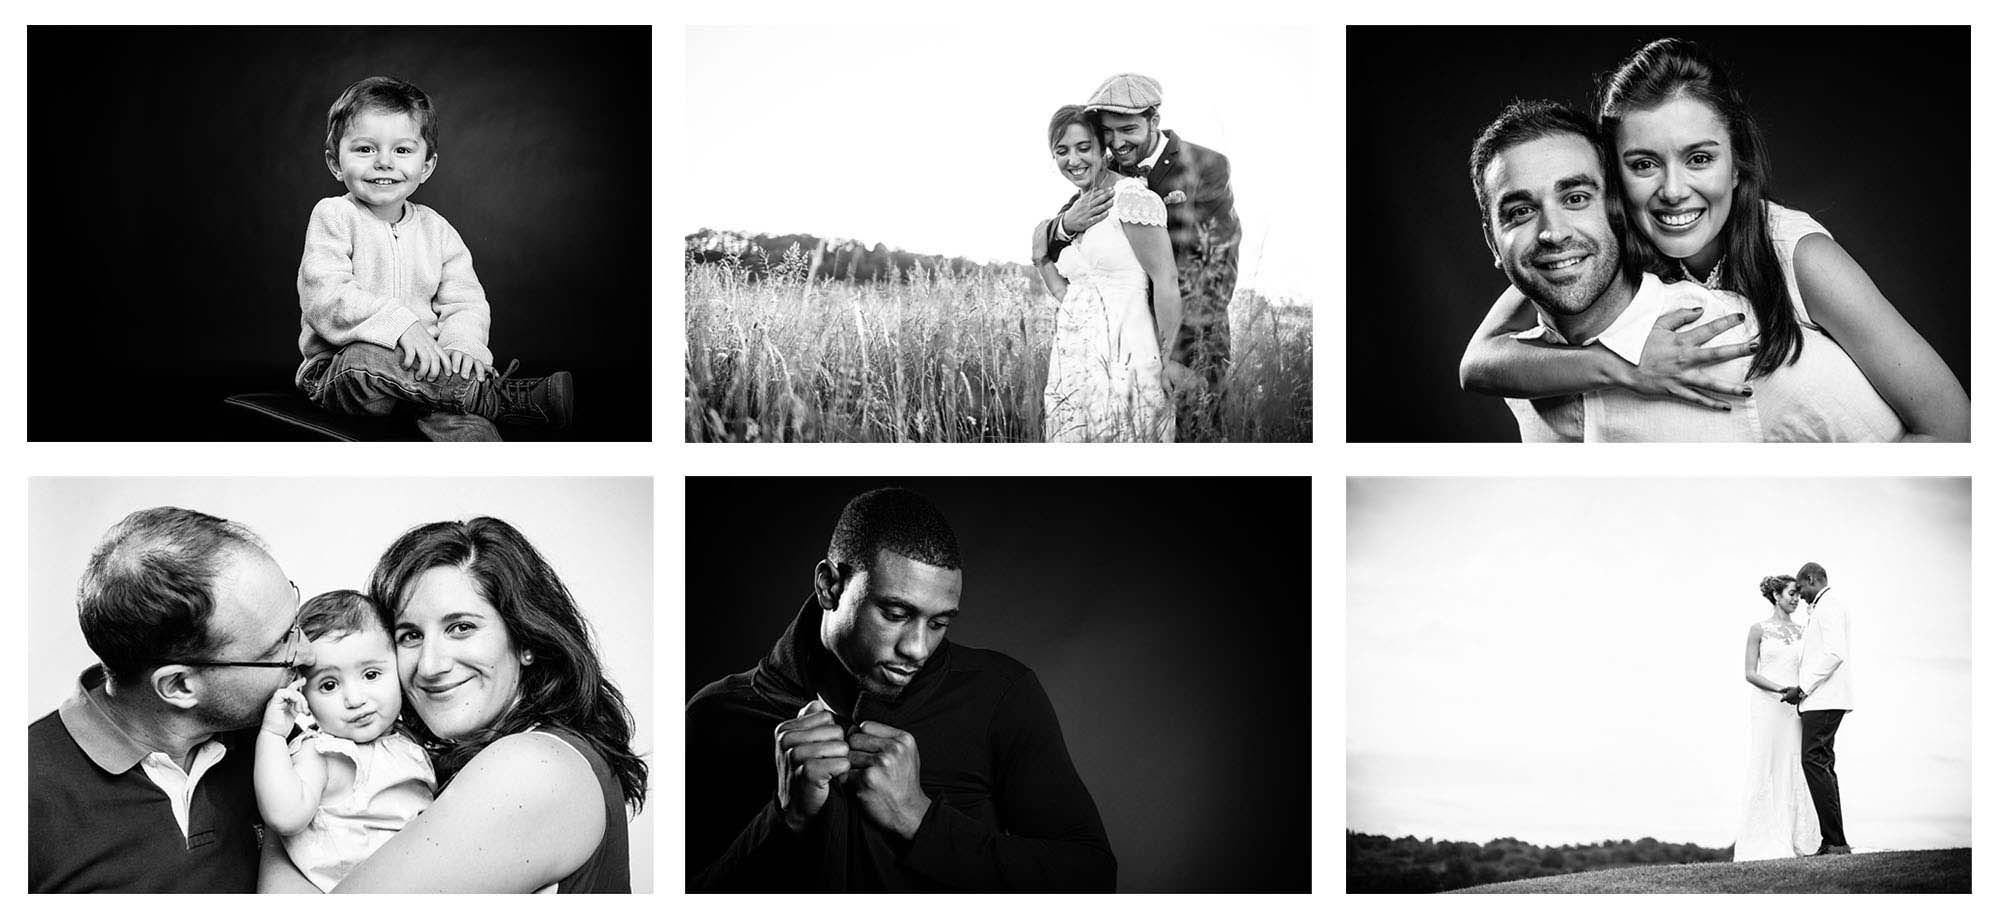 NICOLAS-RAVINAUD-PHOTOGRAPHE-FAMILLE-PORTRAIT-MARIAGE